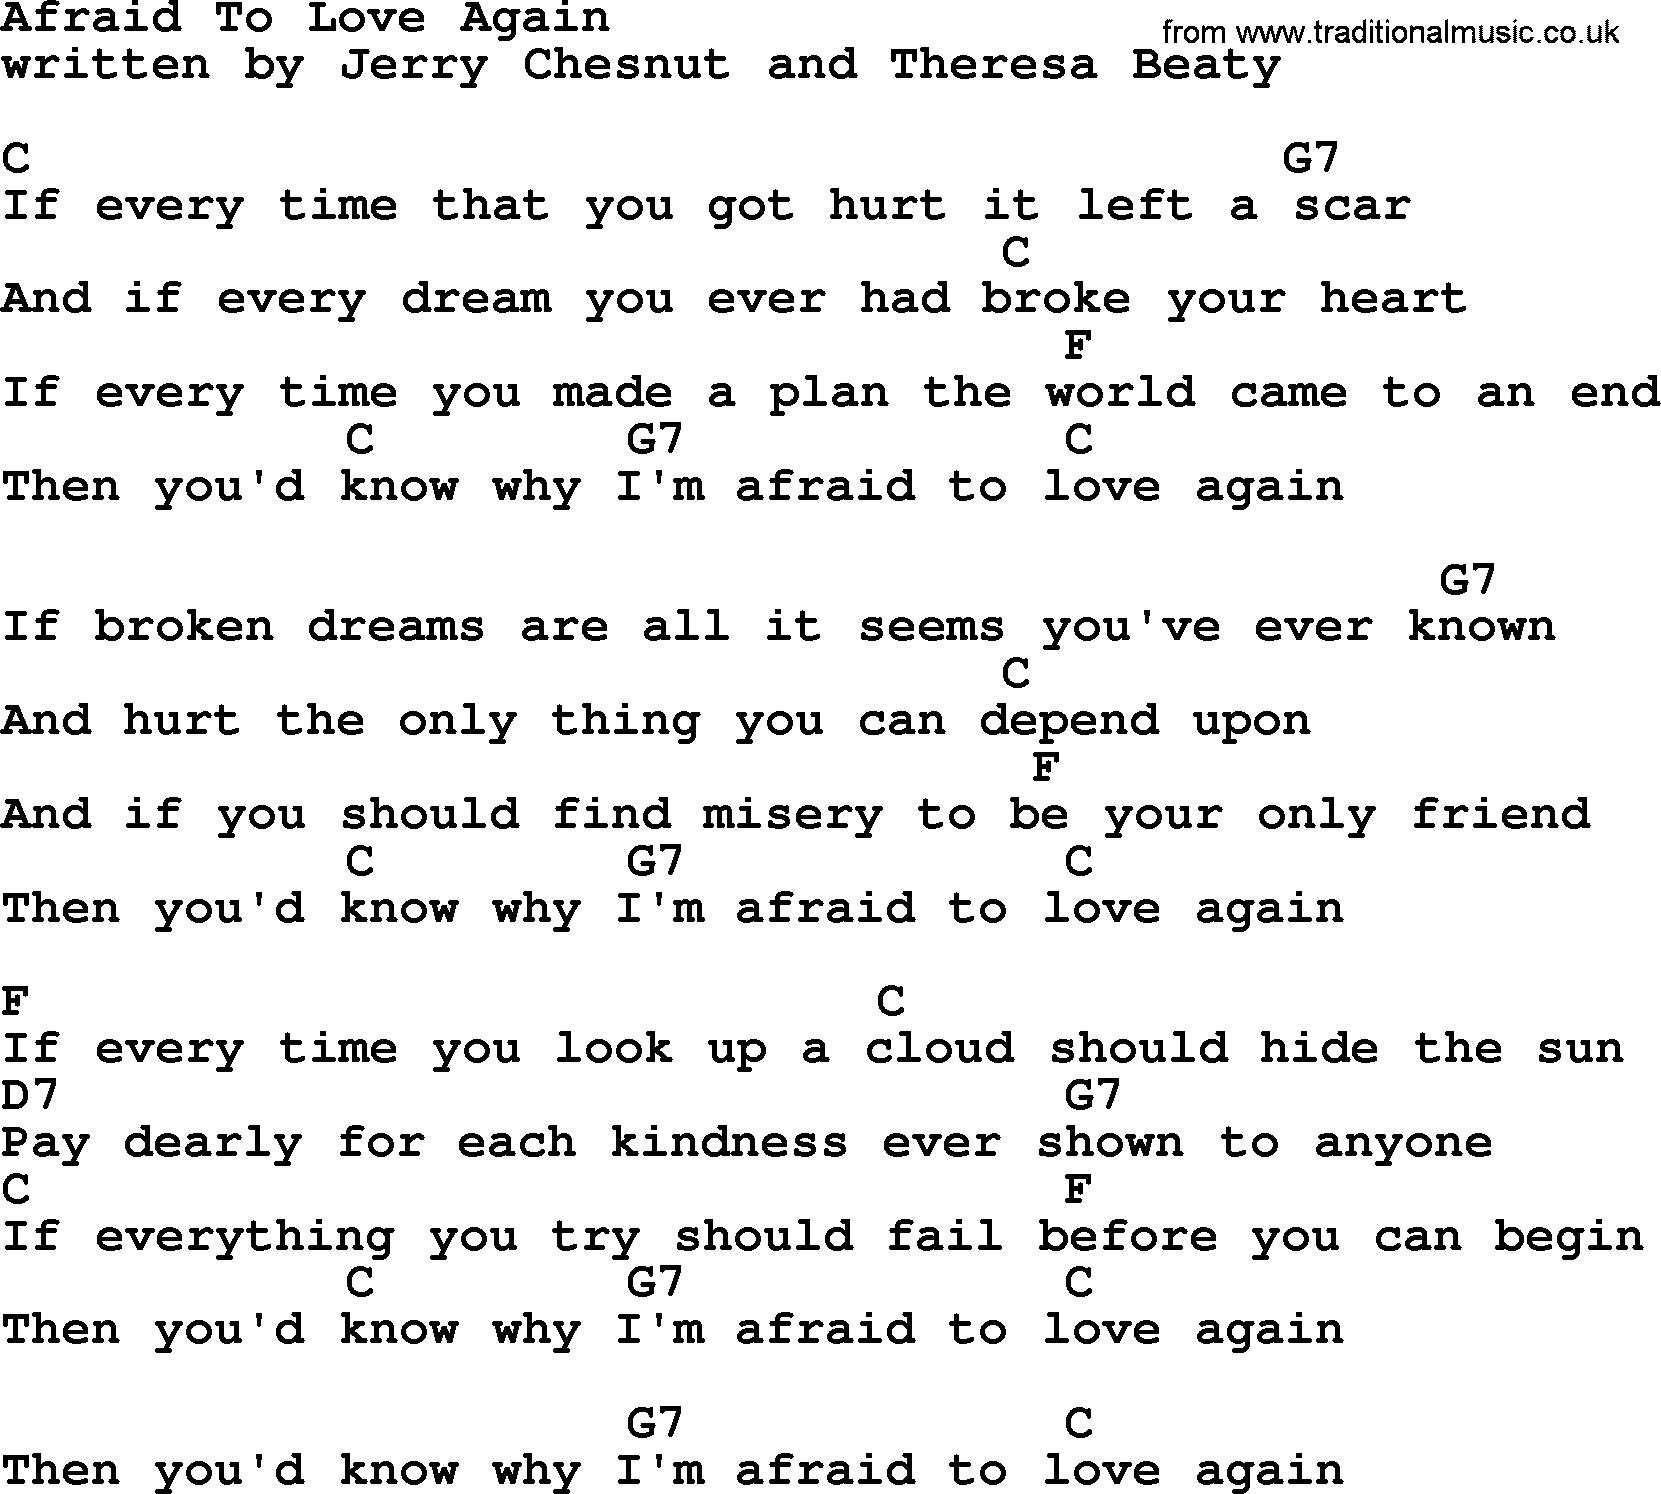 Afraid To Love Again Bluegrass Lyrics With Chords